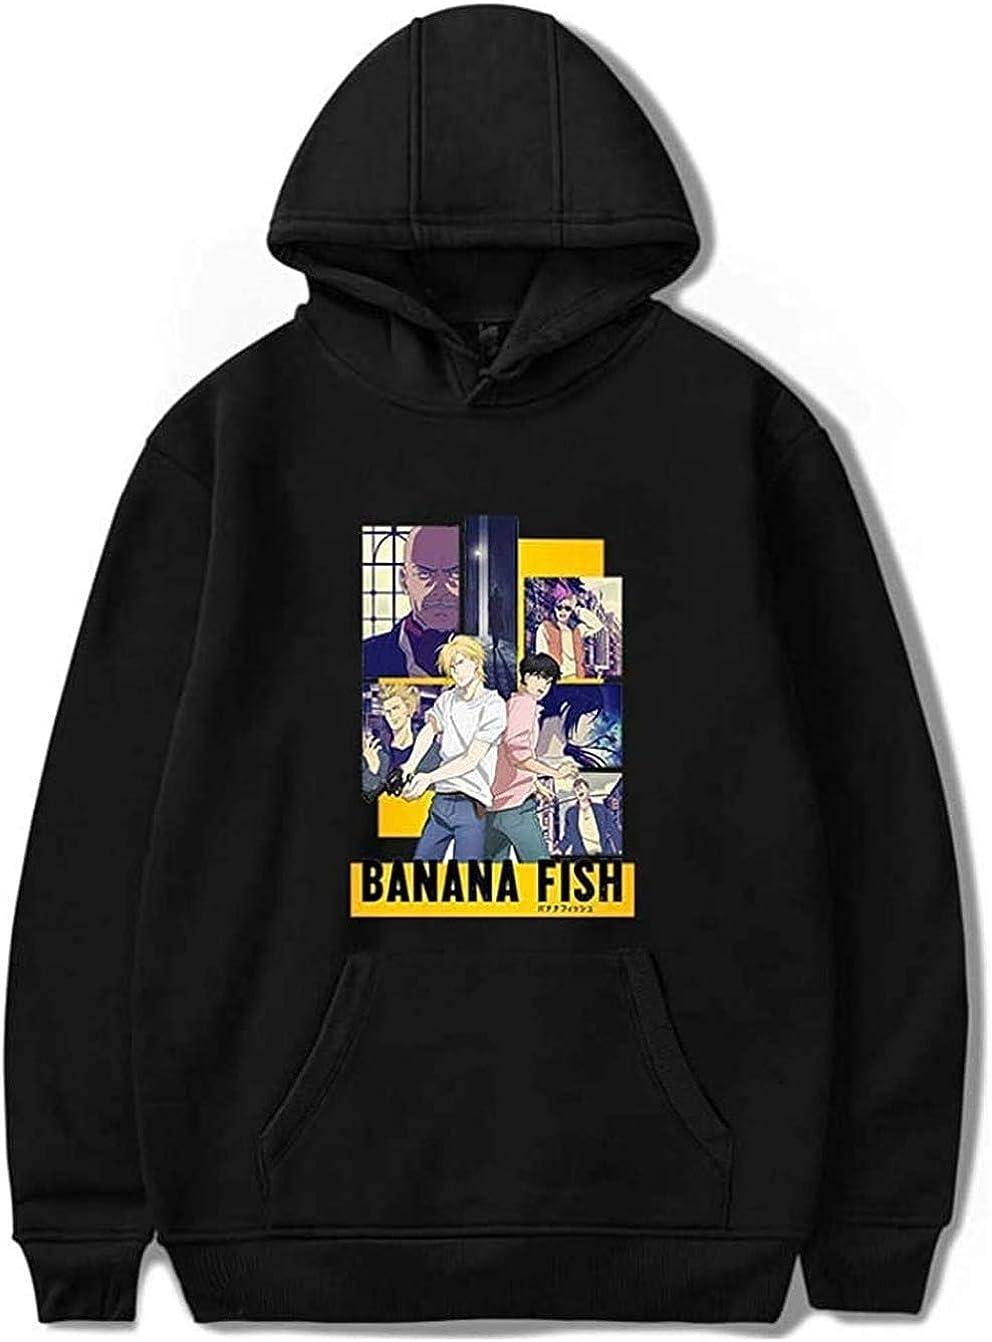 Banana Fish Anime Trust Jeans Hoodies Ash Women Lynx Sweatshirt Super intense SALE Haraju